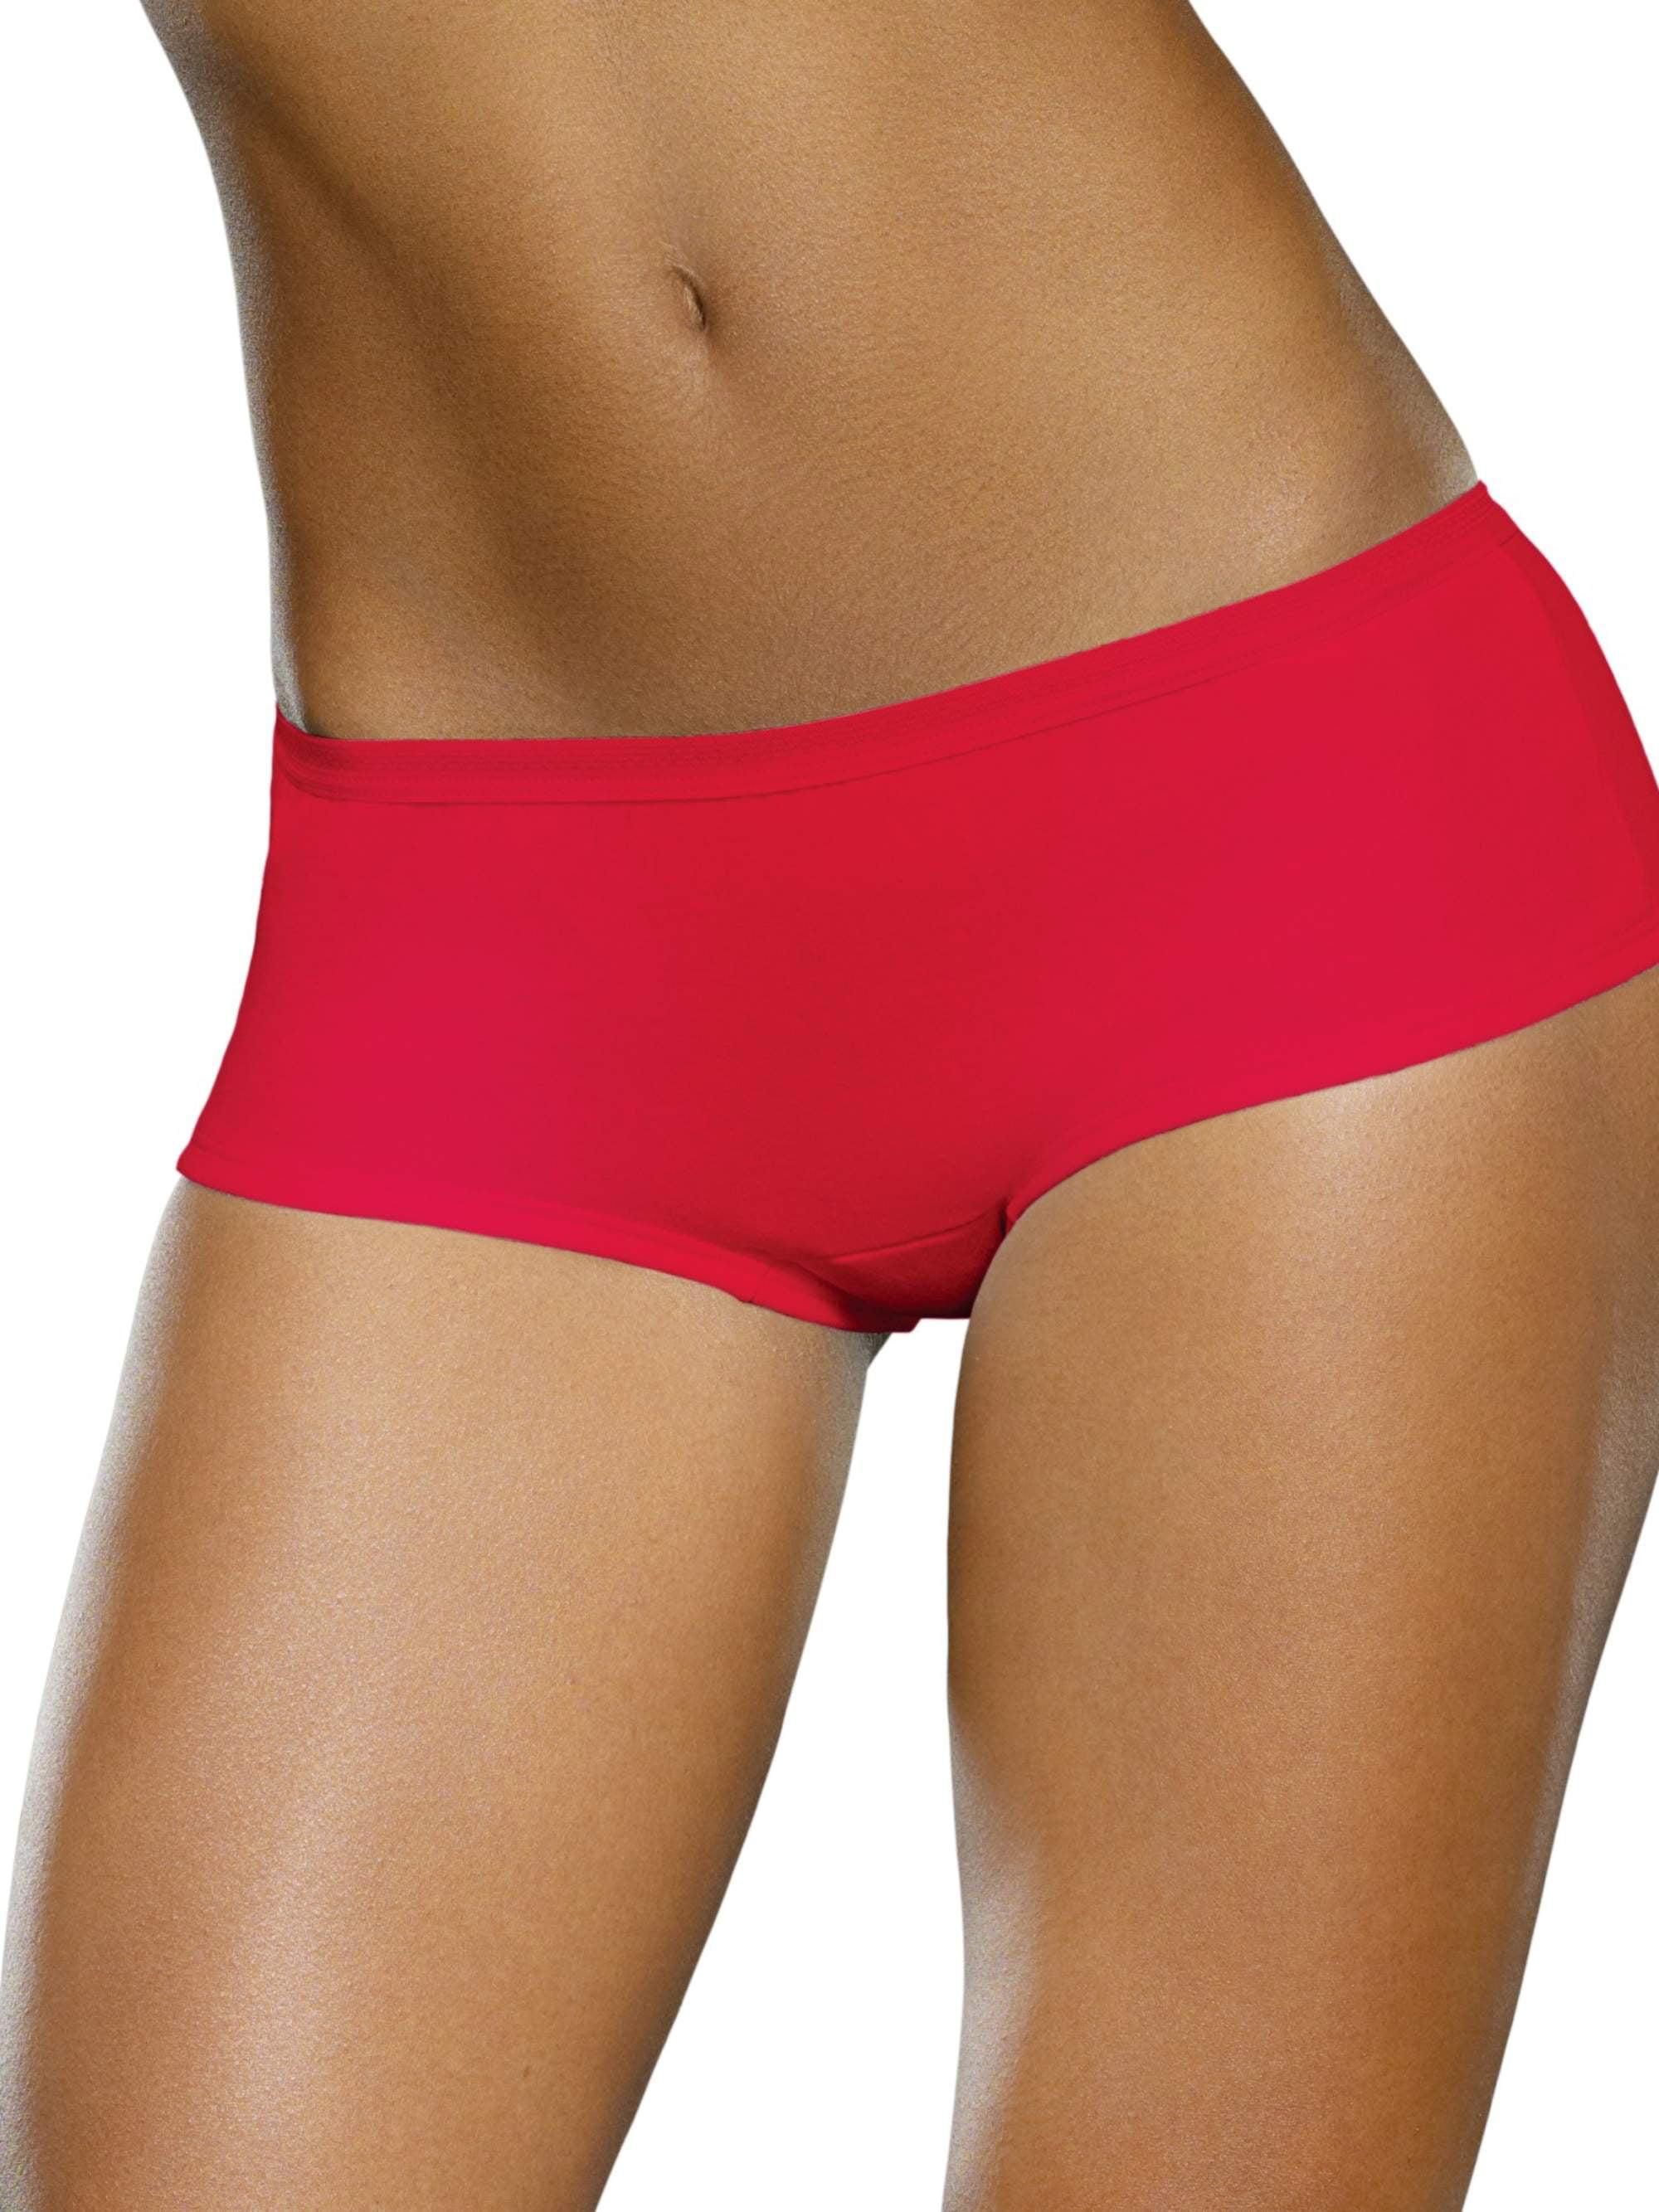 Newly Female Athlete Panties Comfort Women Boxers Underwear Soft Sports Shorts